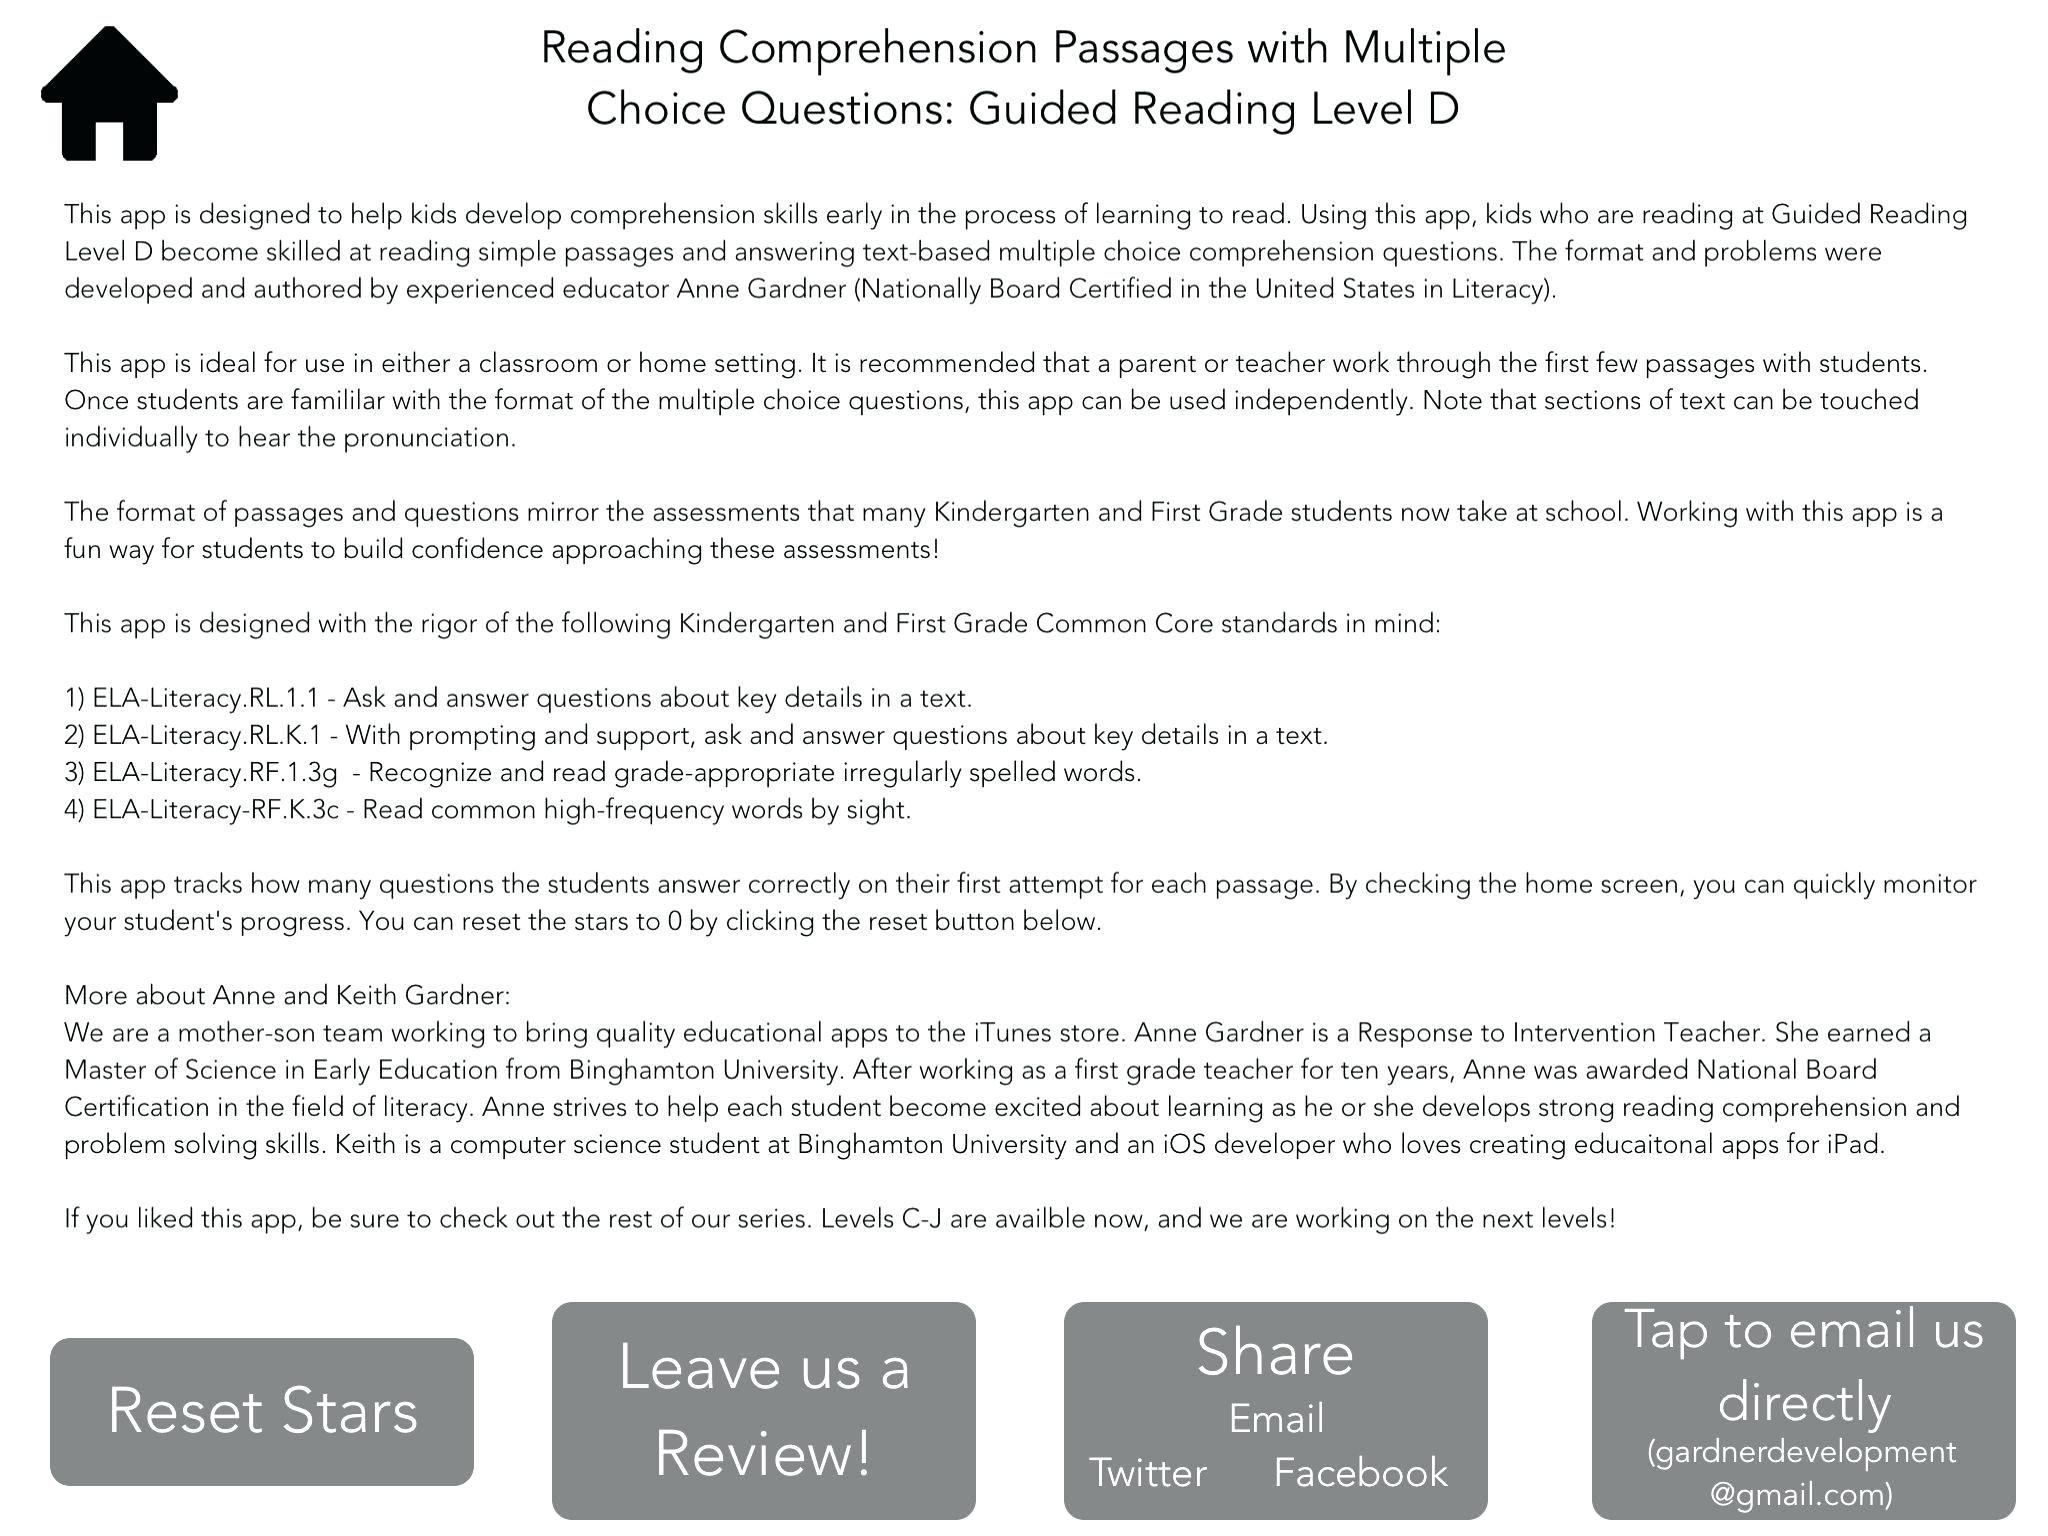 4Th Grade Reading Comprehension Worksheets Pdf For Download  Math Inside 8Th Grade Reading Comprehension Worksheets Pdf